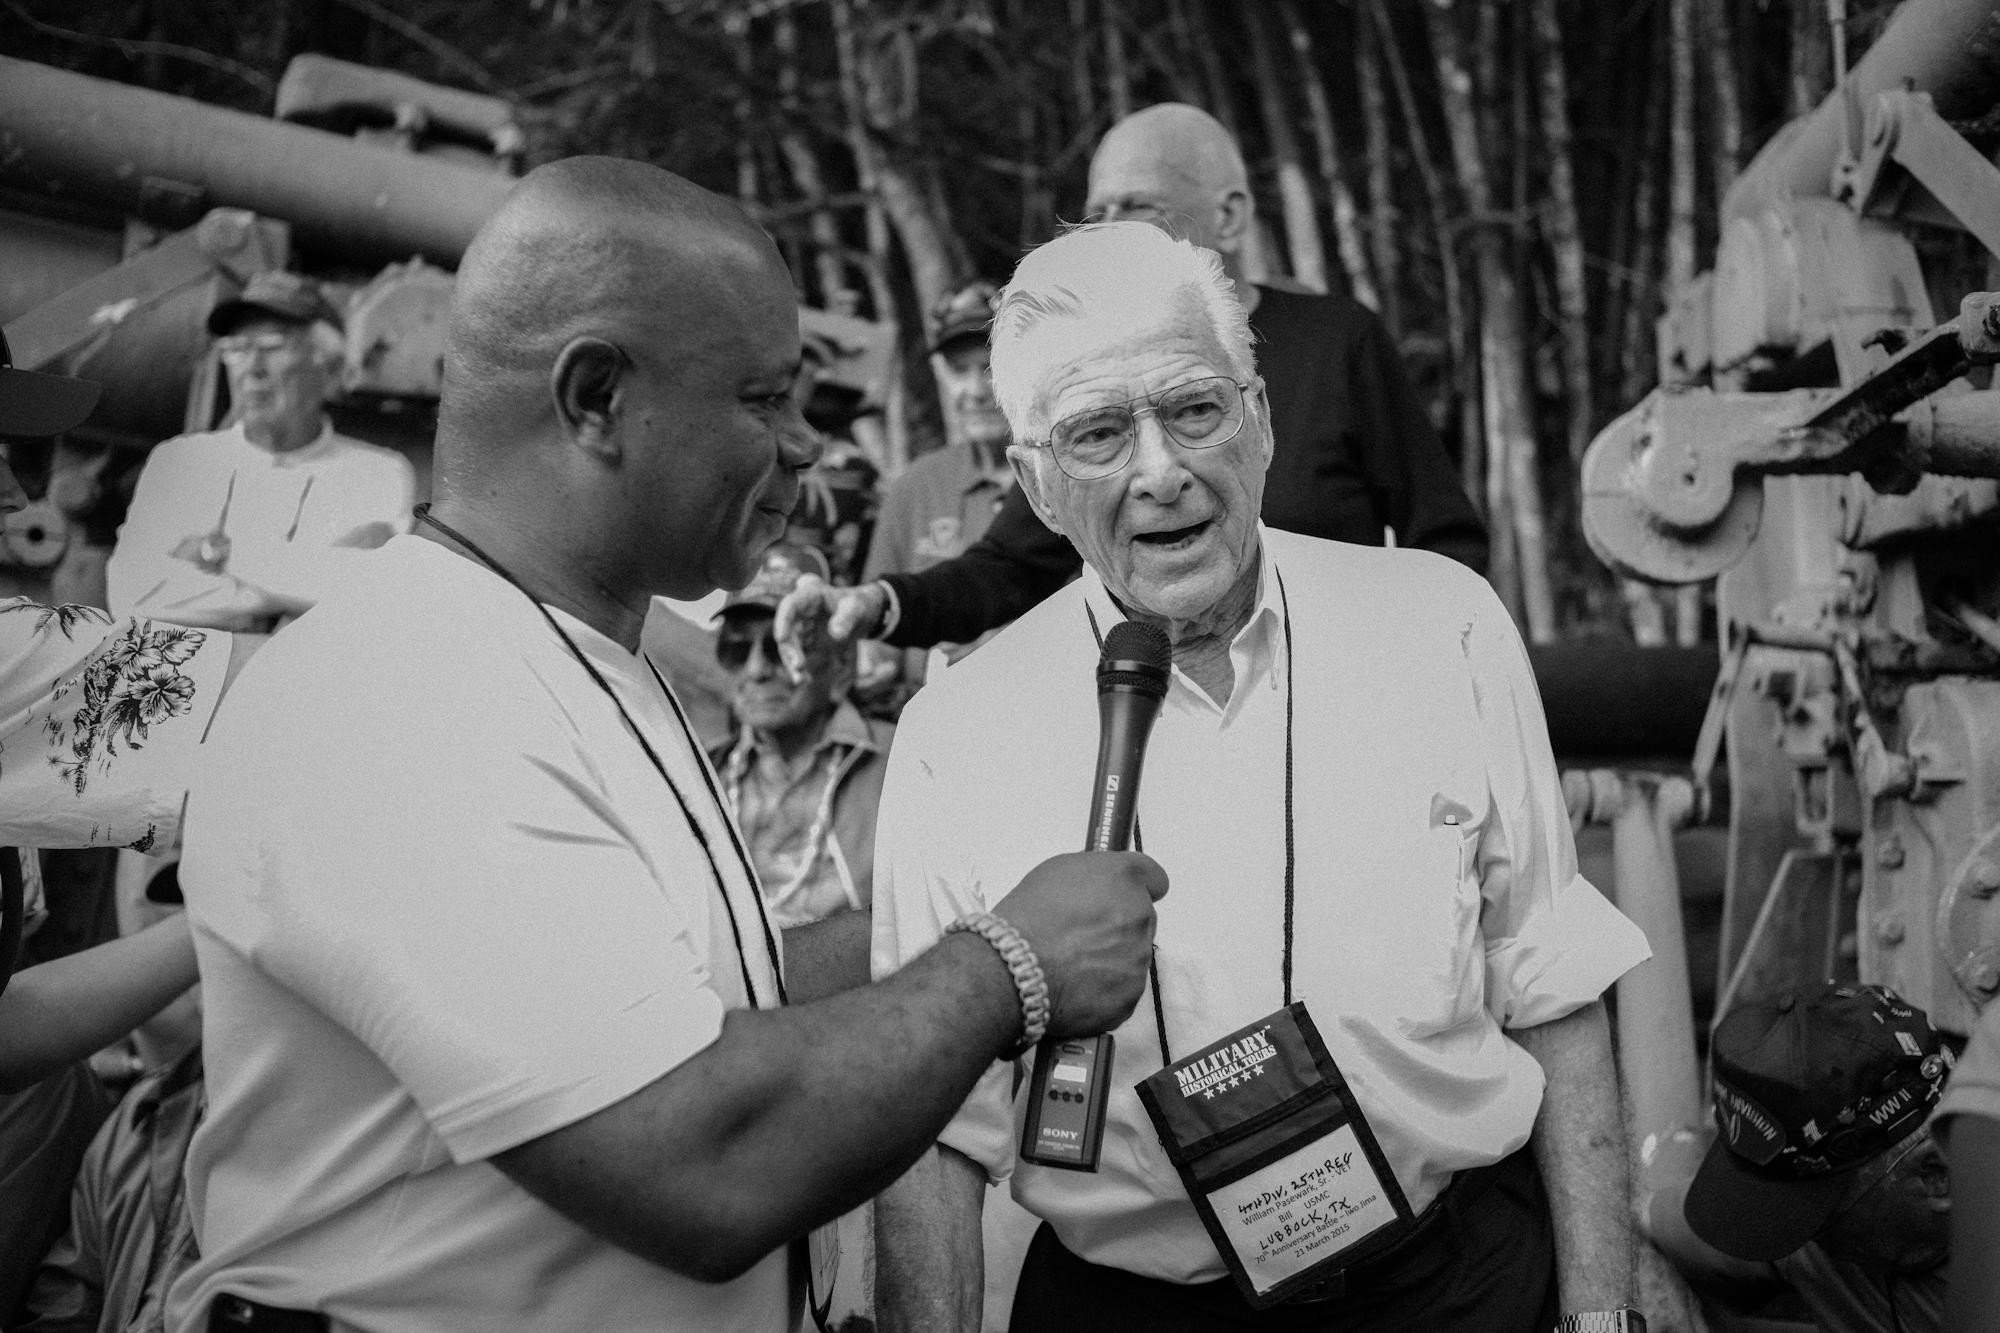 David Webb (David Webb Show) interviewing Iwo Jima veteran Bill Pasewark